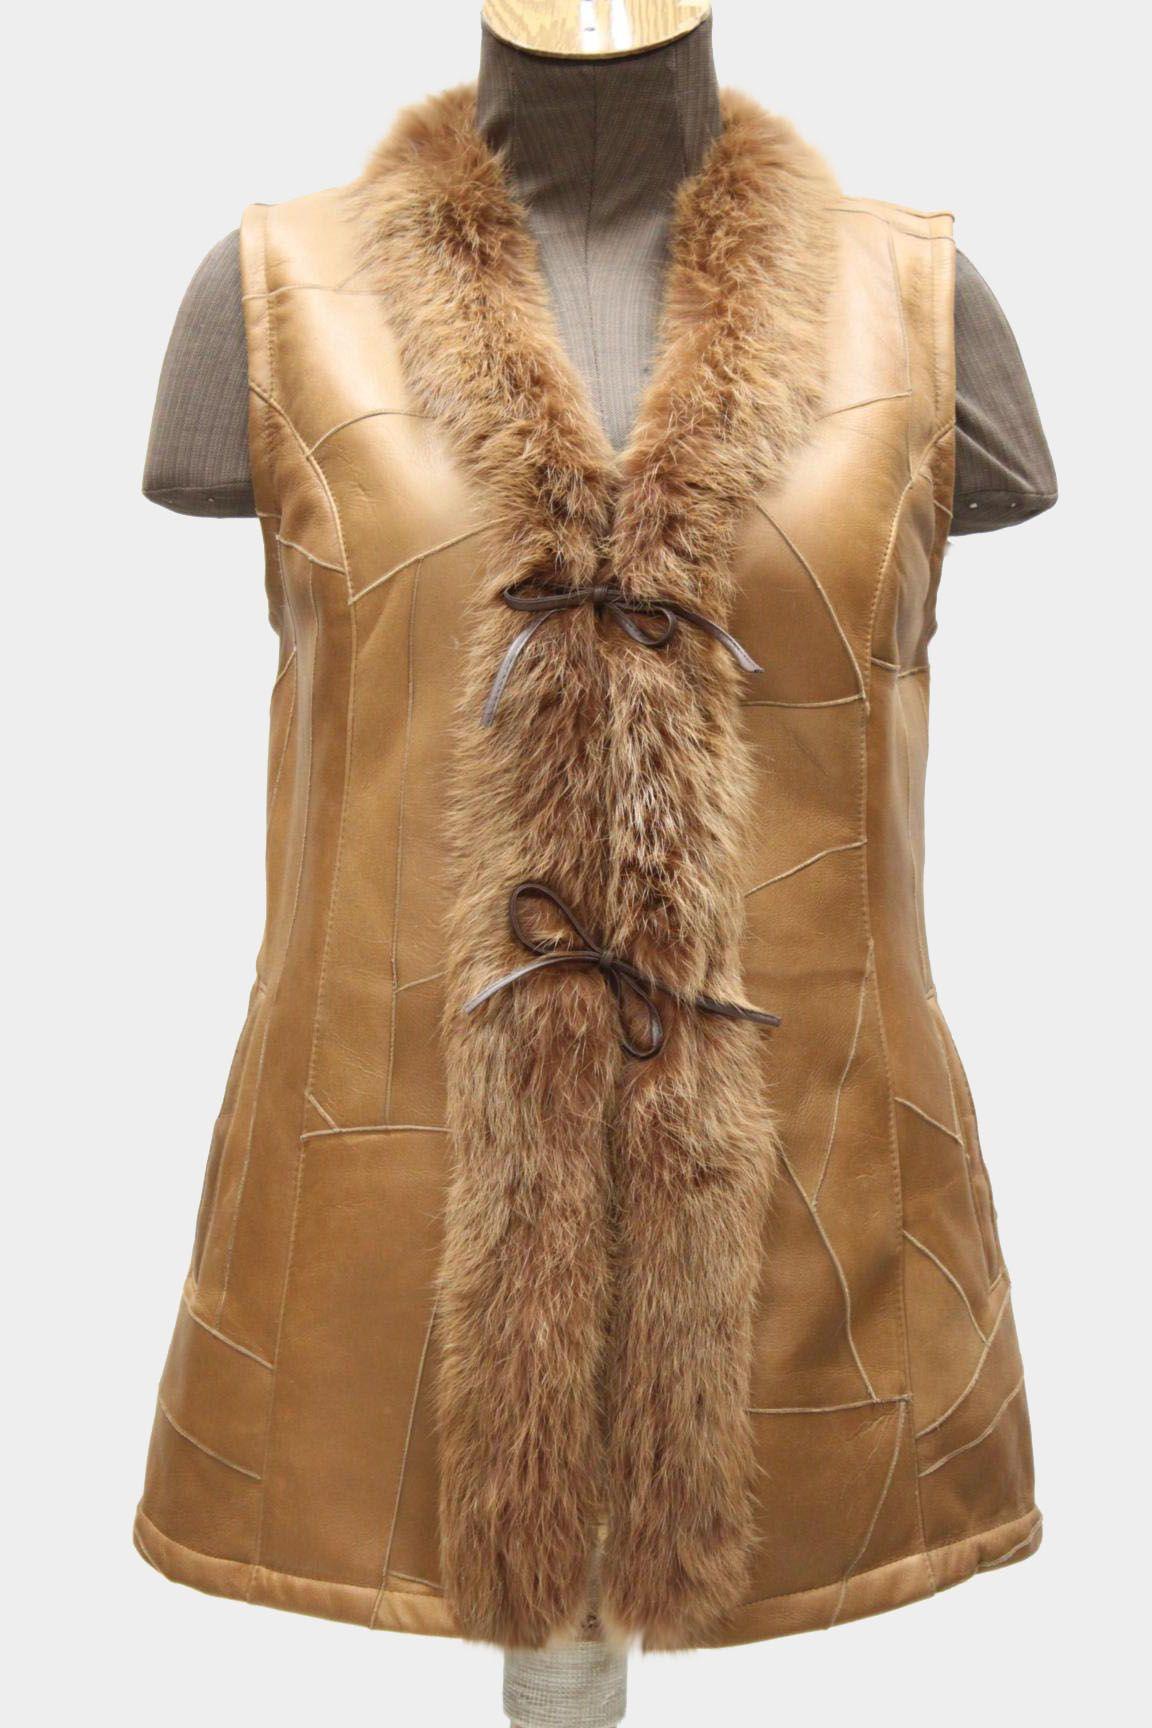 Kozuch Naturalny Kamizelka Damska 42 Jorfa 81 7013913394 Oficjalne Archiwum Allegro Fashion Coat Fur Coat